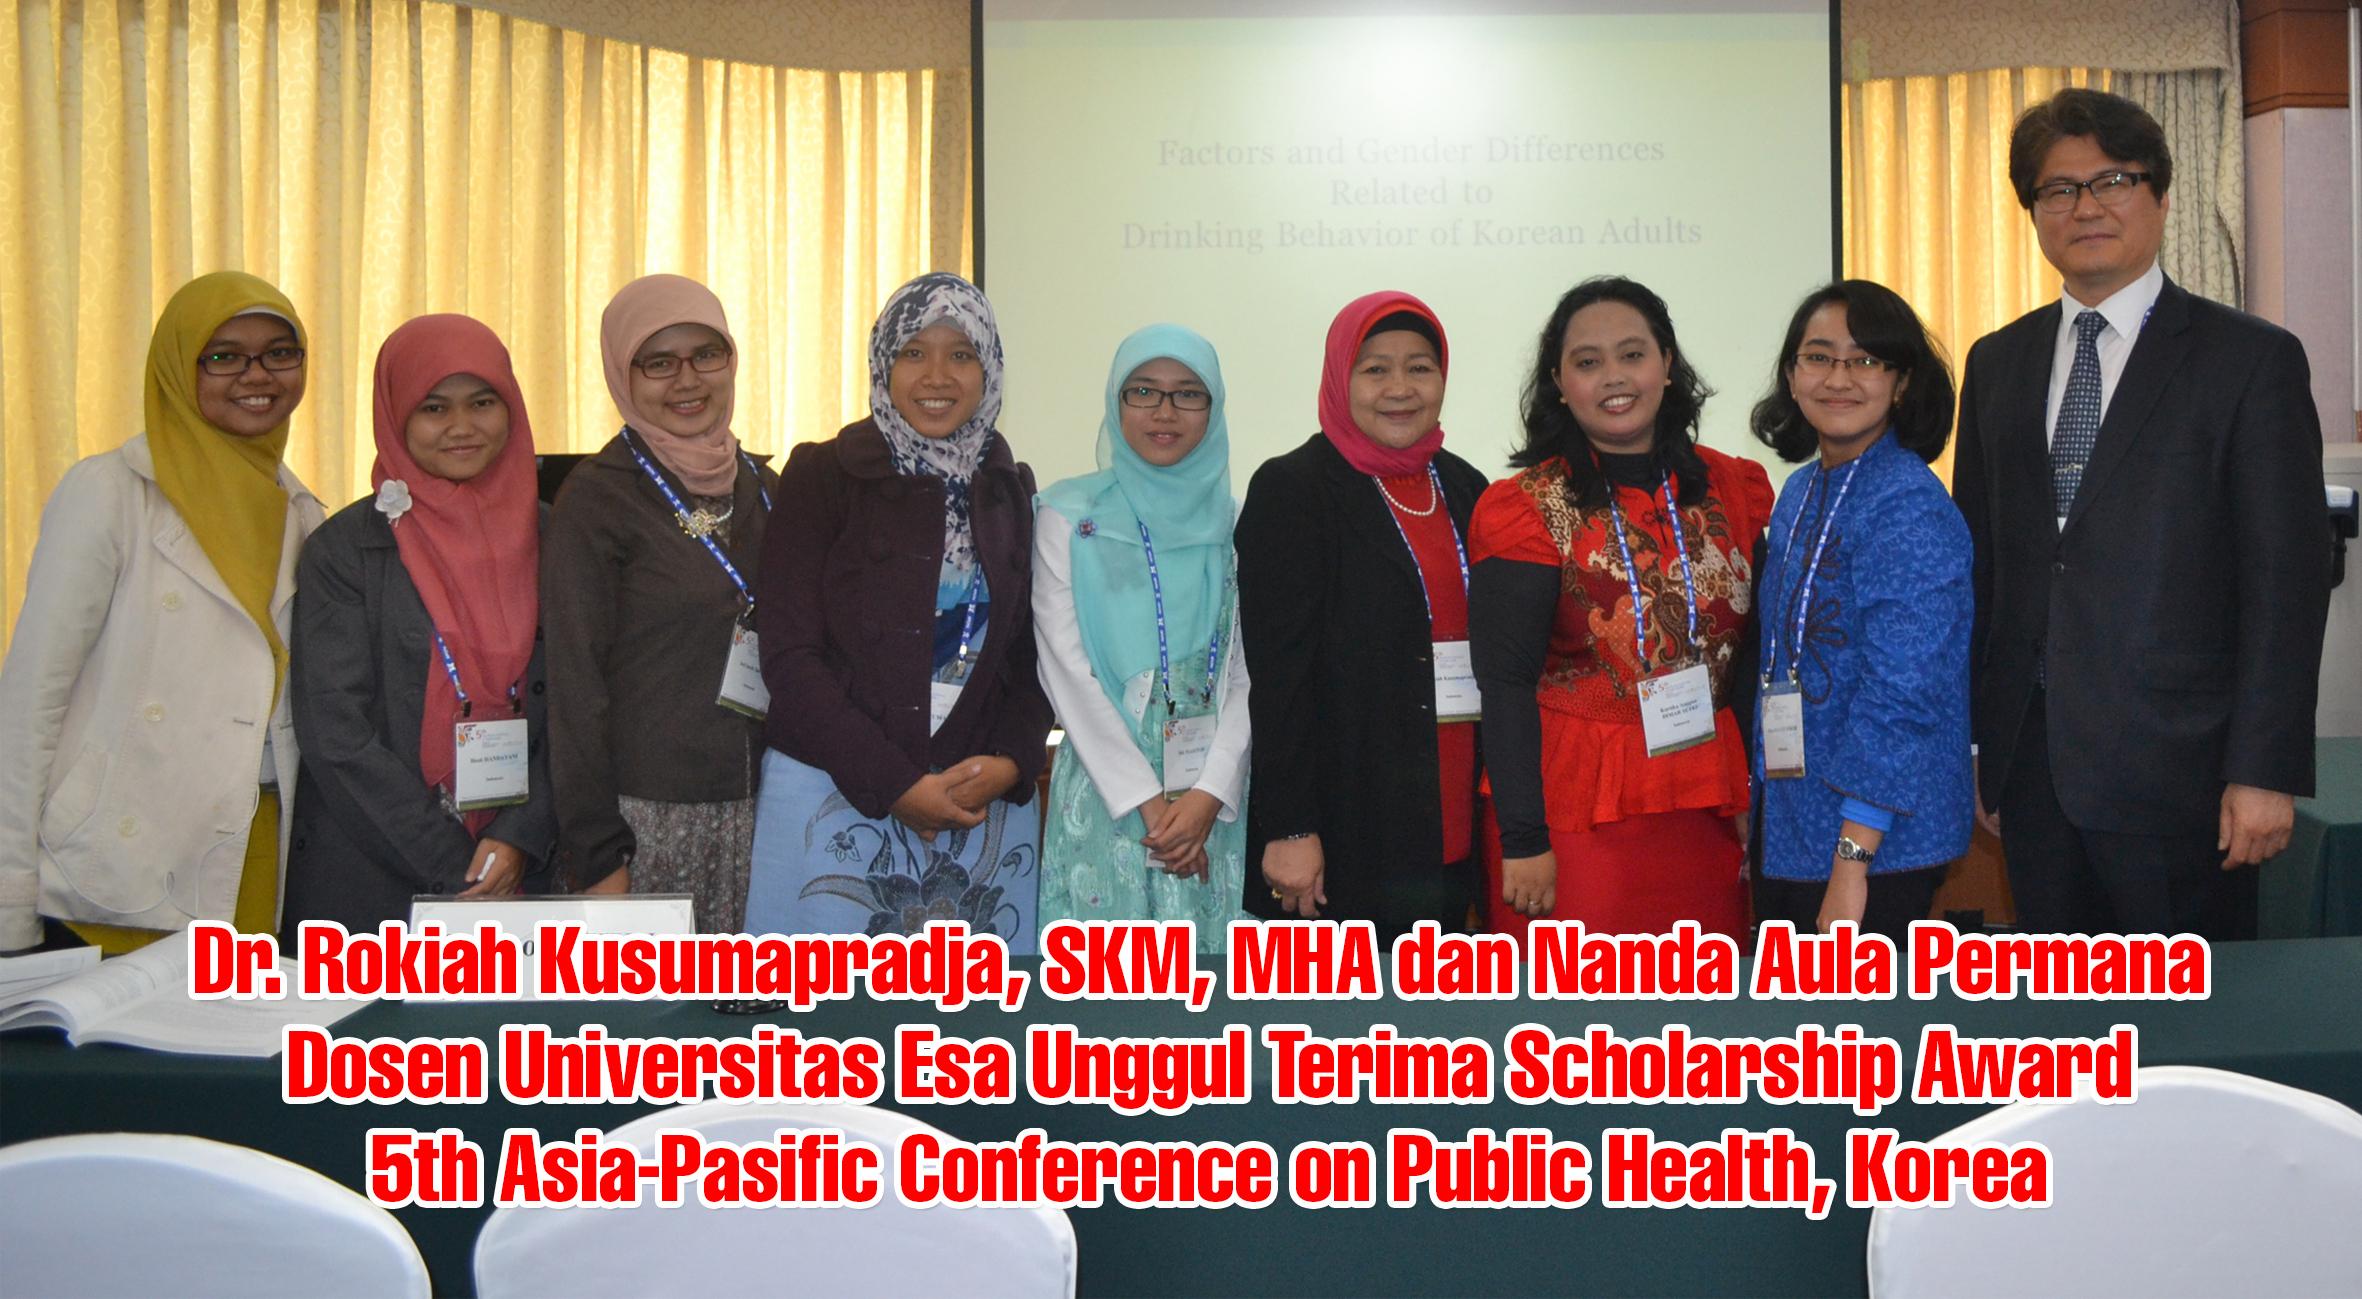 Dr. Rokiah Kusumapradja, SKM, MHA dan Nanda Aula Permana – Dosen Universitas Esa Unggul Terima Scholarship Award, 5th Asia-Pasific Conference on Public Health, Korea